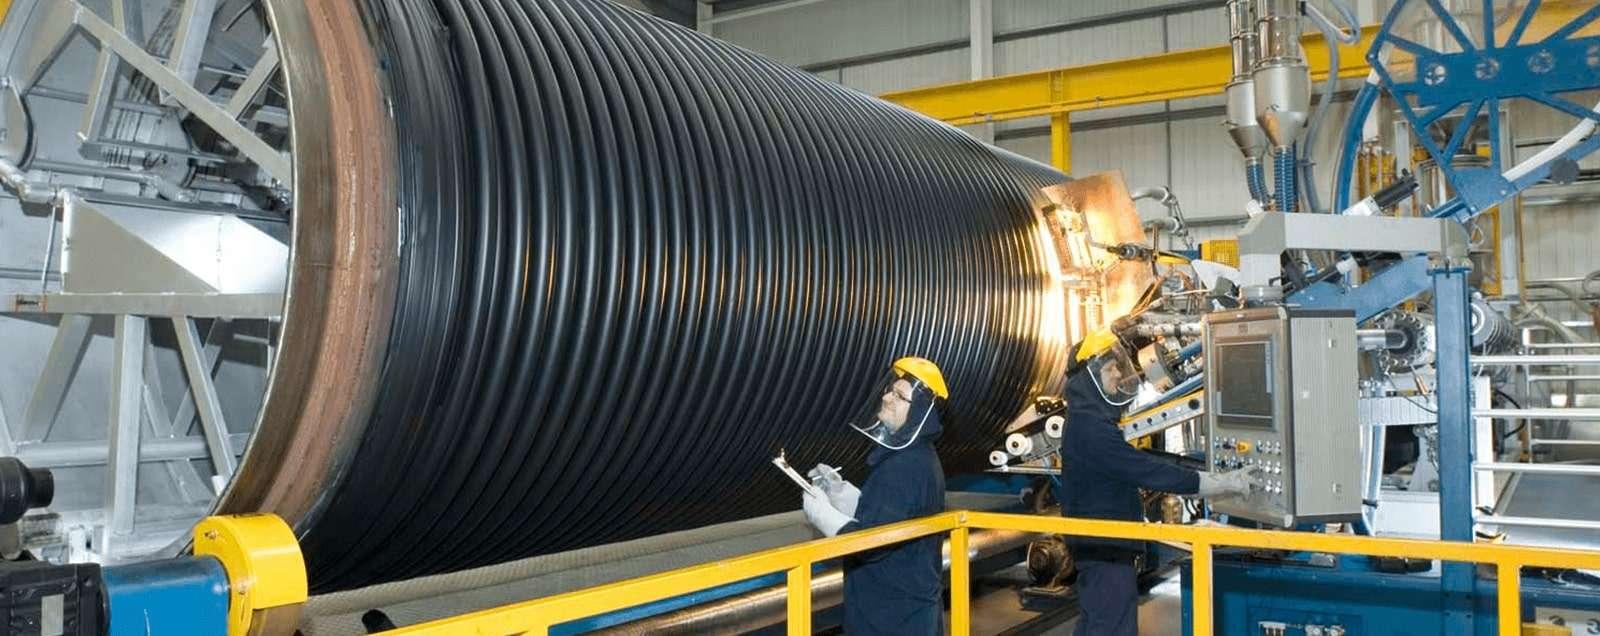 Ridgistorm XL Manufacture